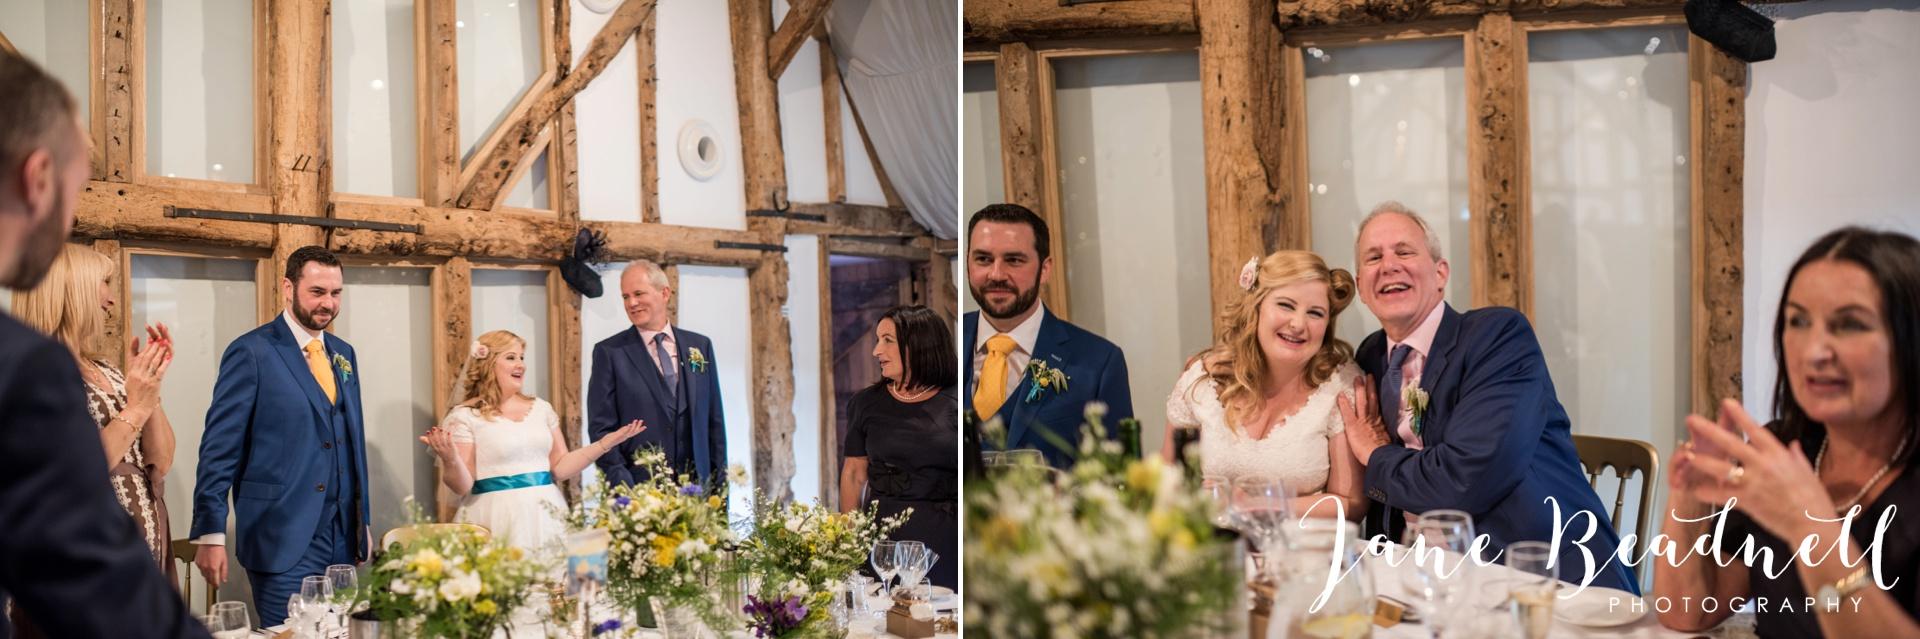 South Farm Wedding photography Hertfordshire by Jane Beadnell Photography fine art wedding photographer_0181